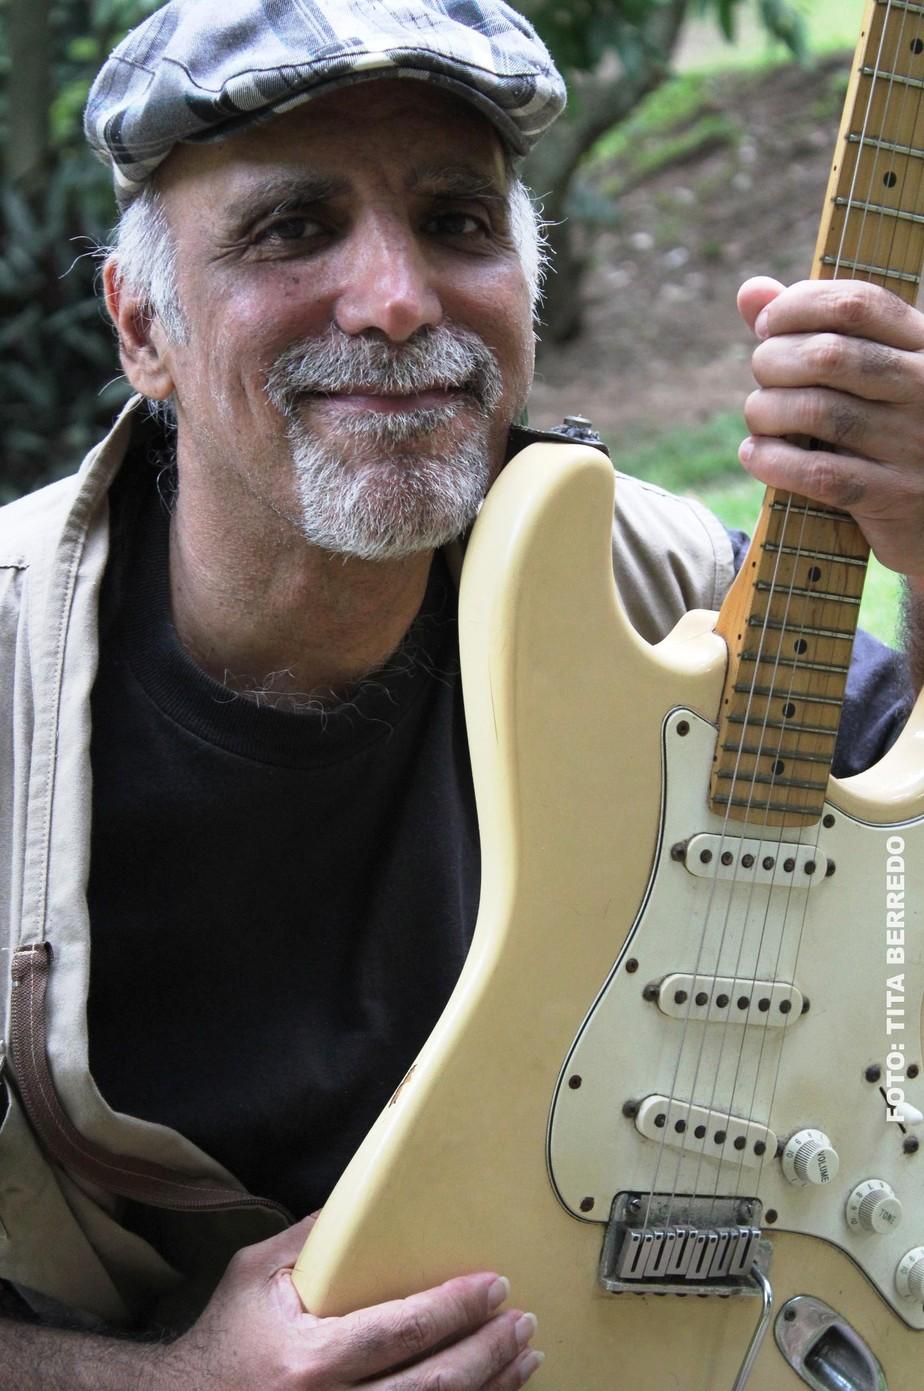 Guto Barros, guitarrista marcante da banda Lobão e Os Ronaldos, morre no Rio de Janeiro aos 61 anos